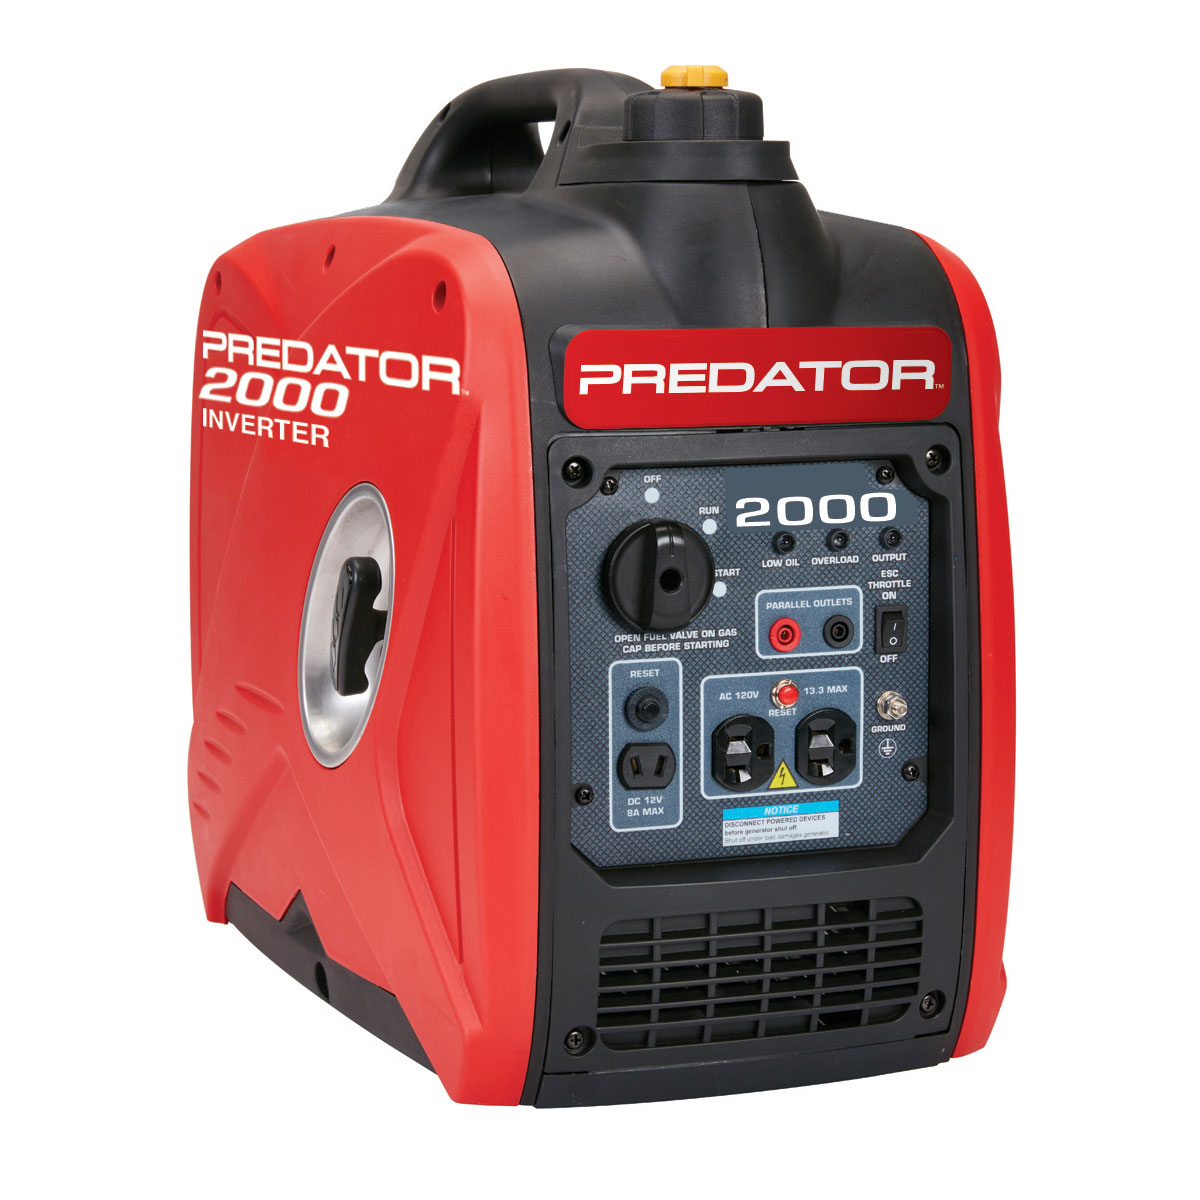 PREDATOR GENERATORS 2000 Watt Super Quiet Inverter Generator - Item 62523